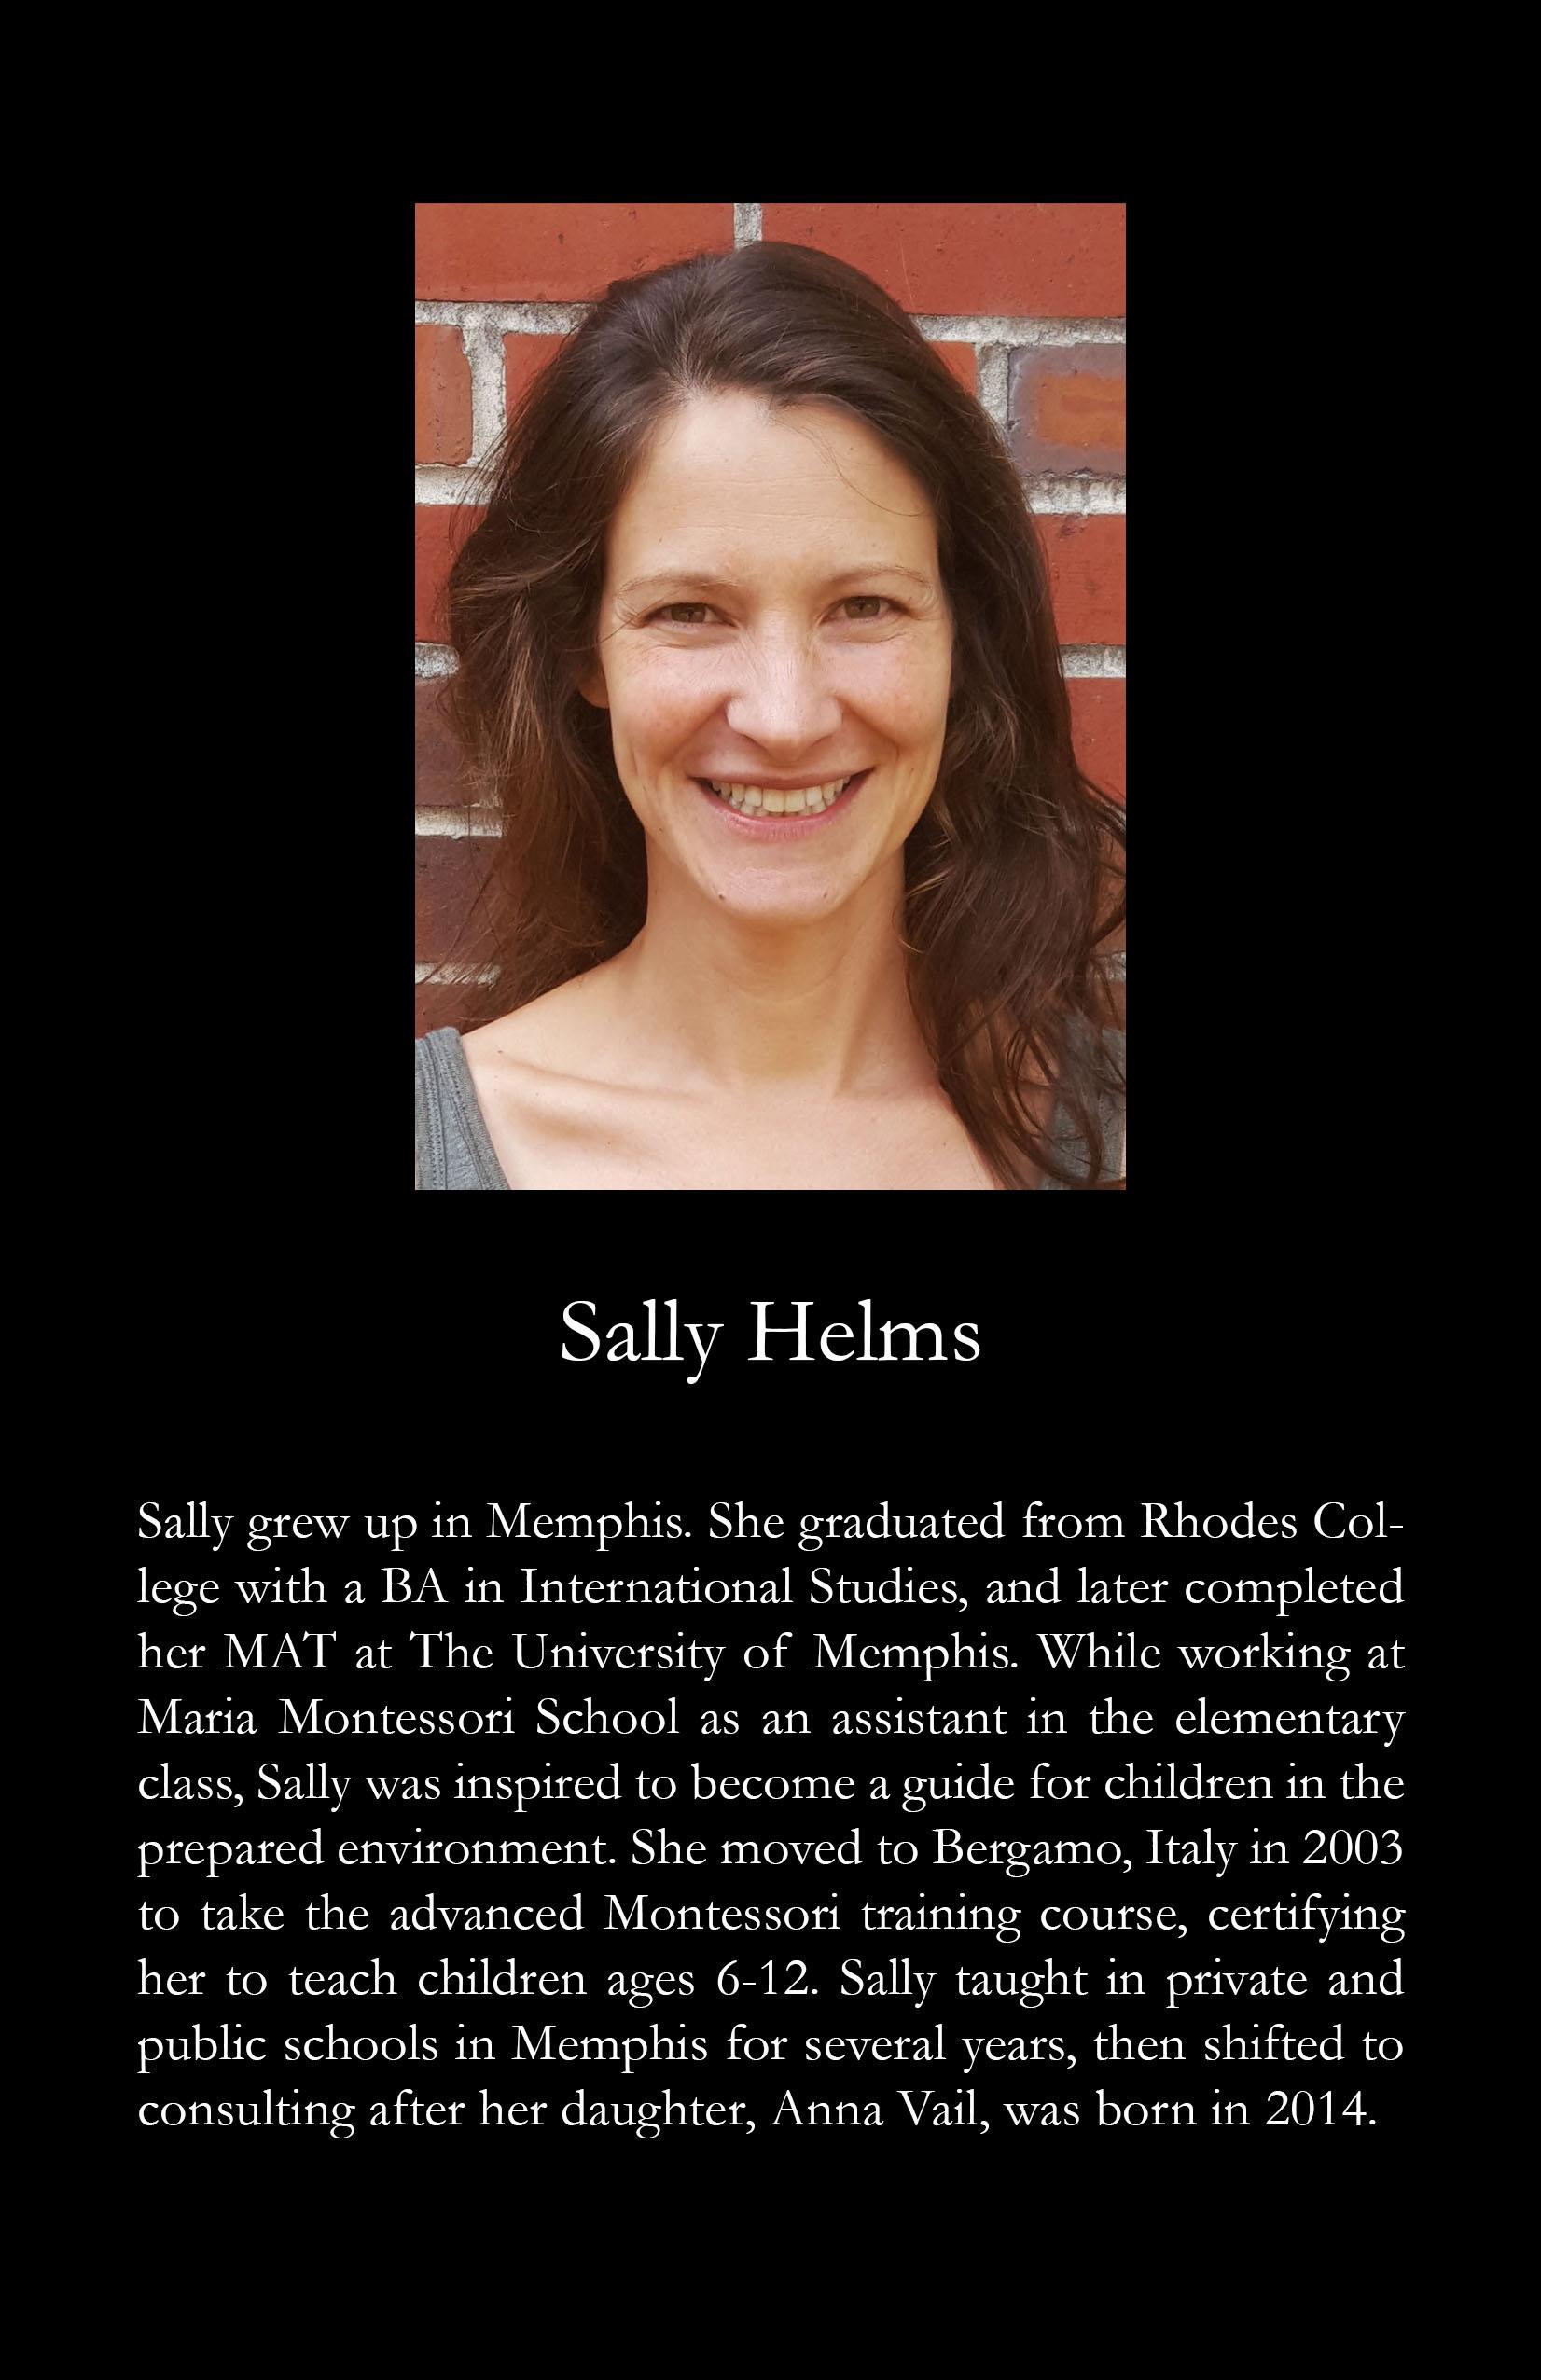 Sally Helms.jpg